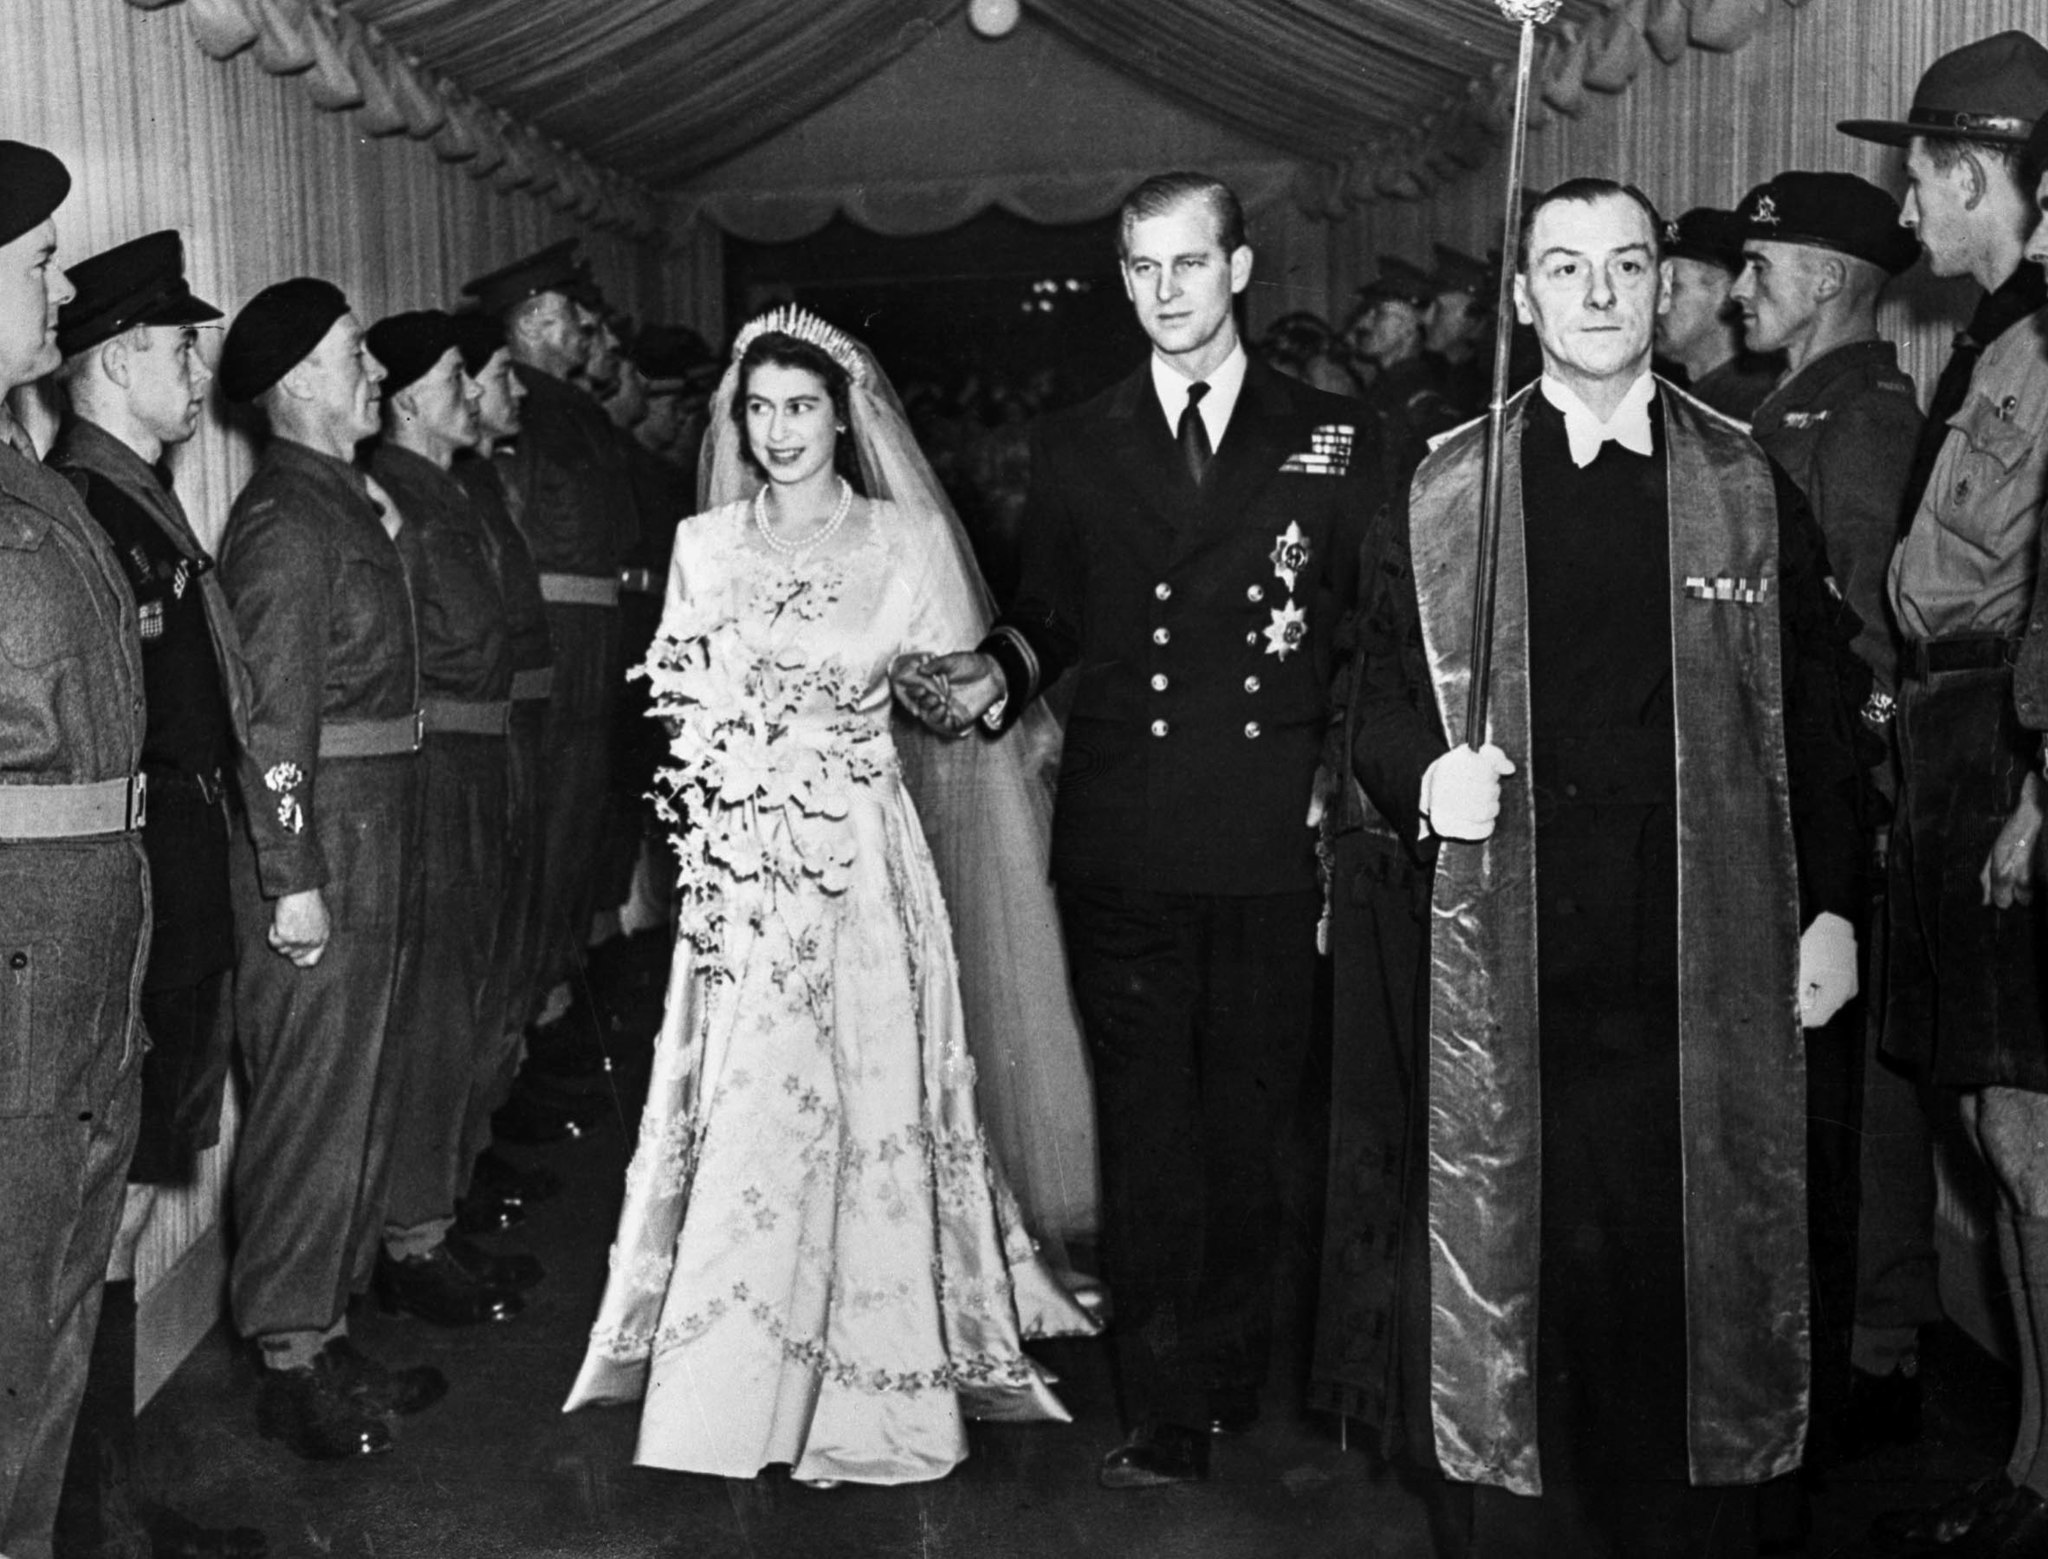 Princess Margaret Wedding.Royal Wedding Princess Elizabeth And Prince Philip S 1947 Wedding